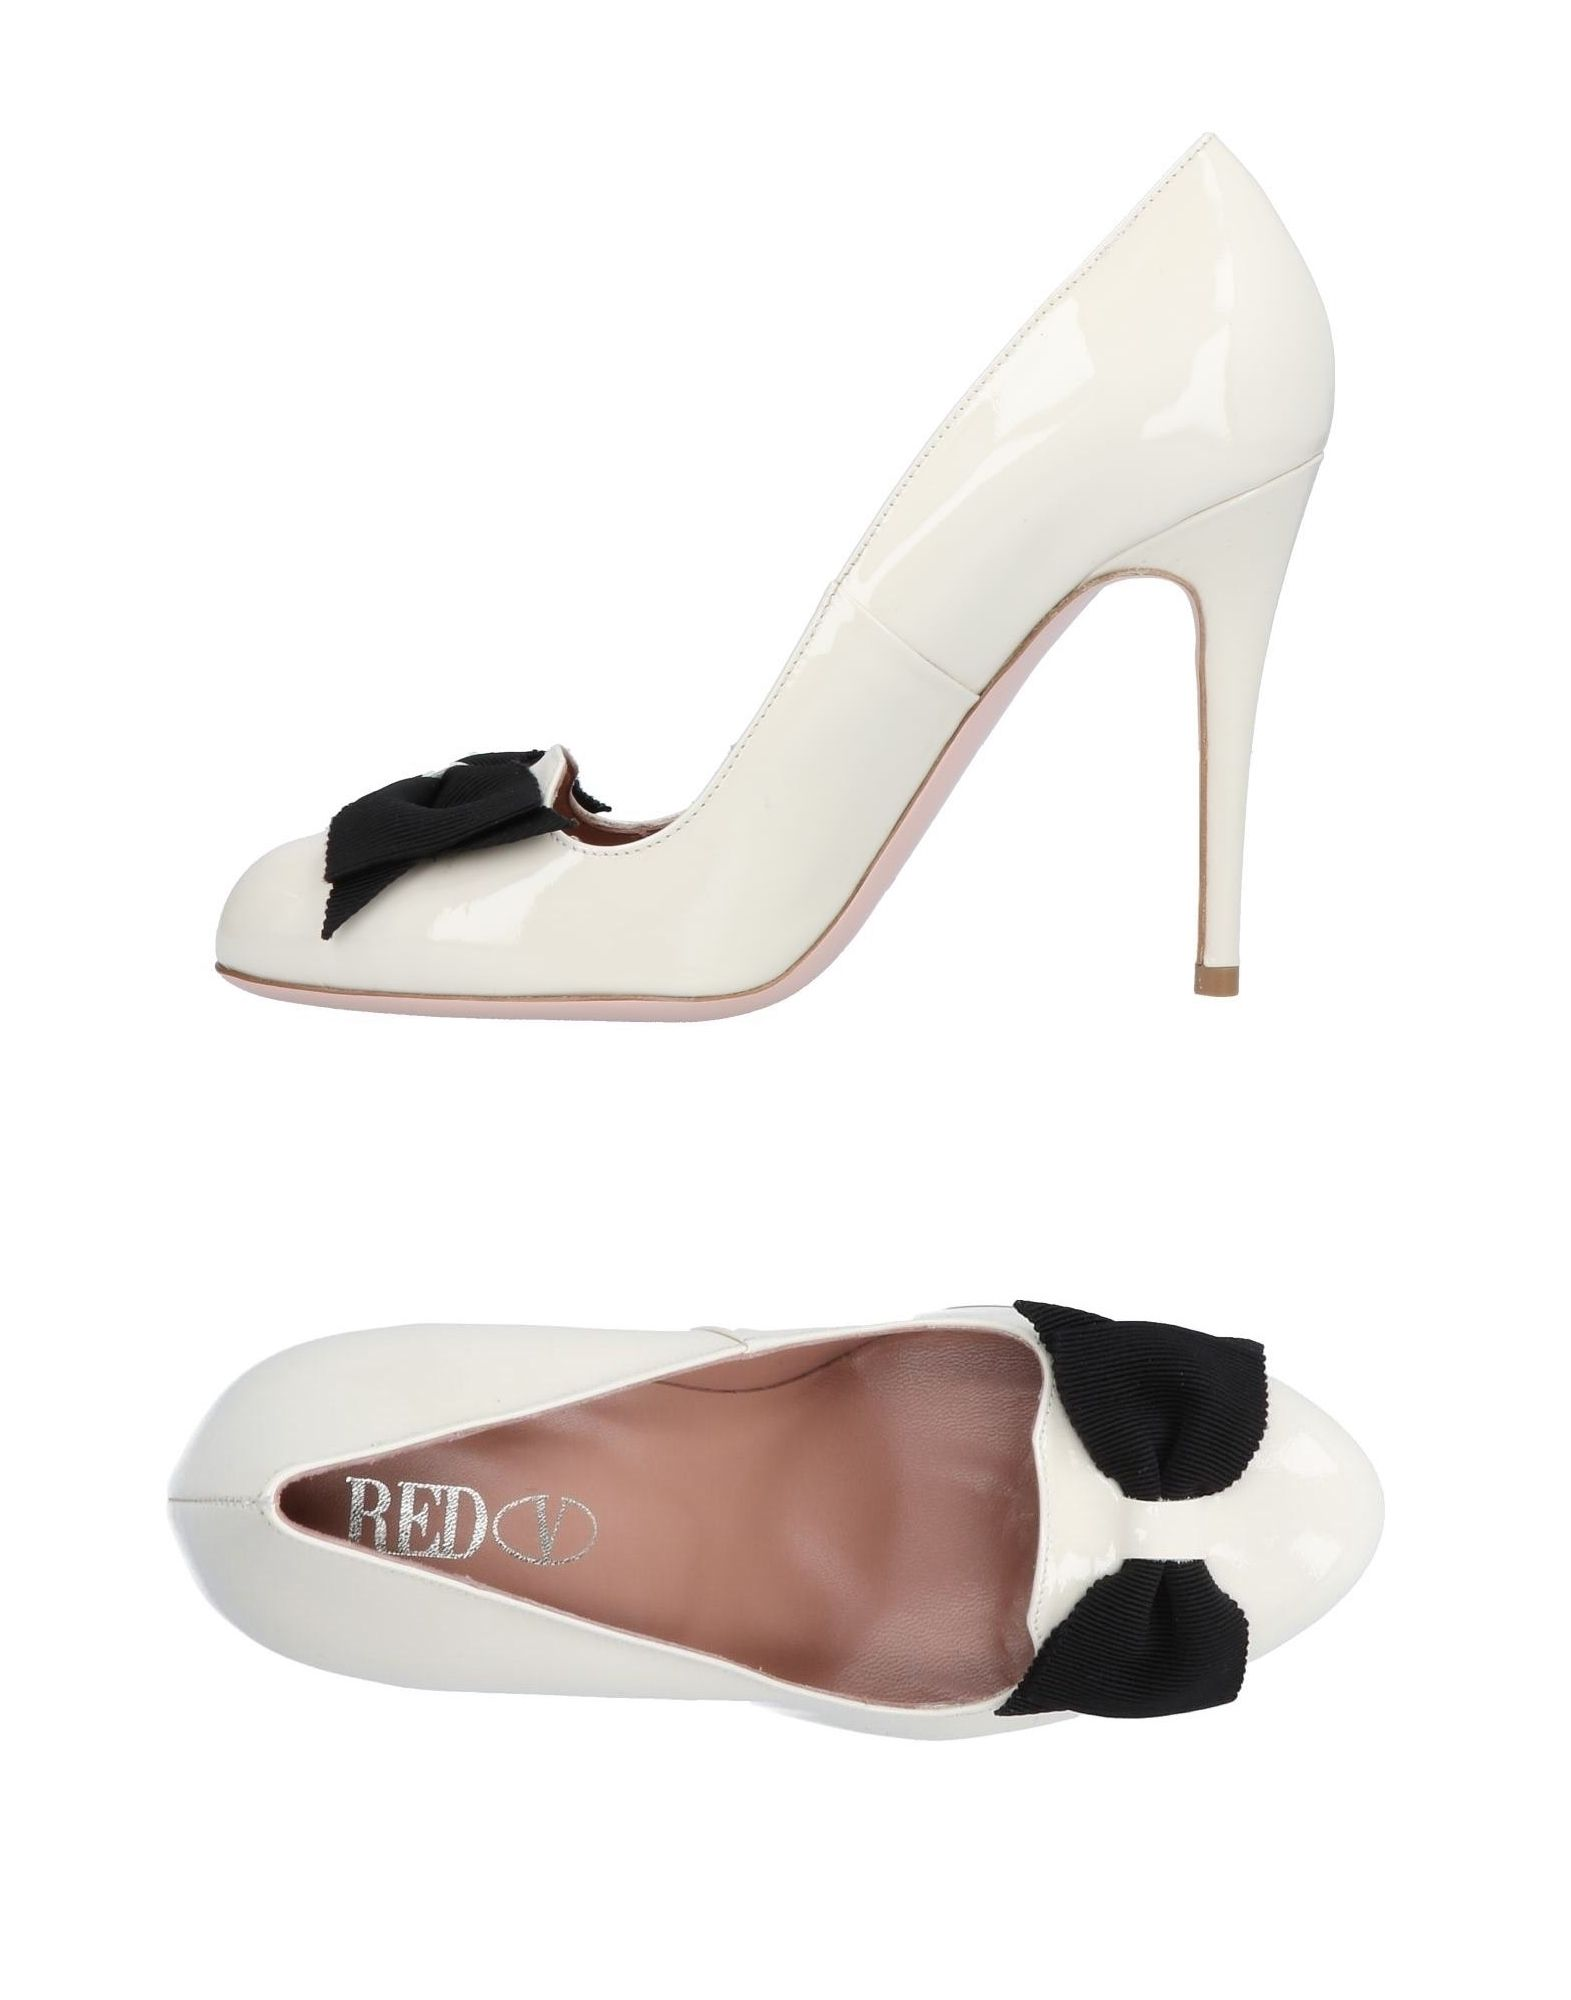 Stilvolle billige Schuhe Damen Red(V) Pumps Damen Schuhe  11489180VM 5cd83f